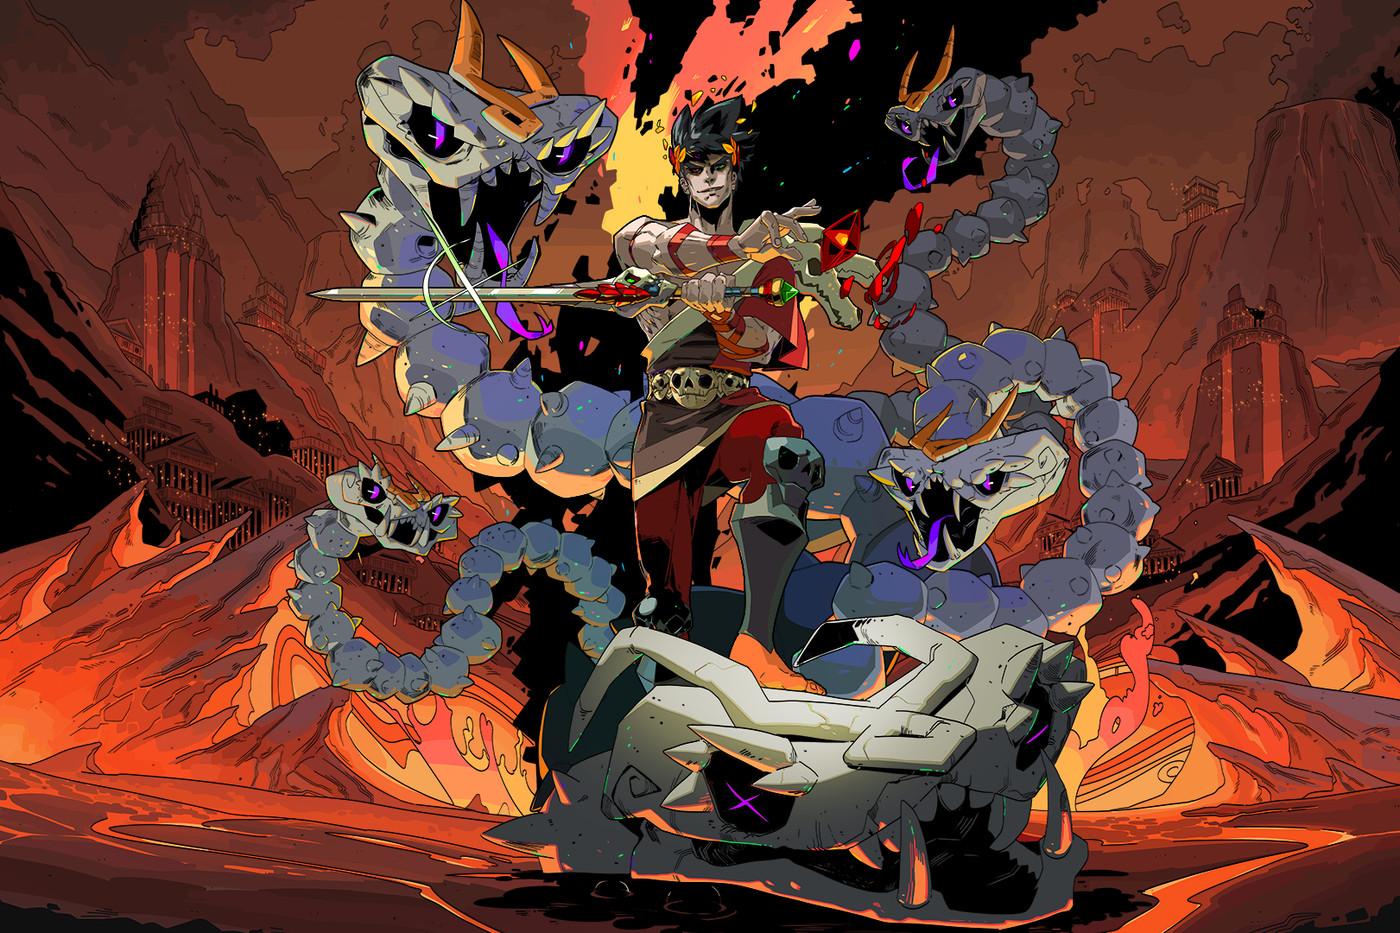 Hades-Supergiant Games(2020)